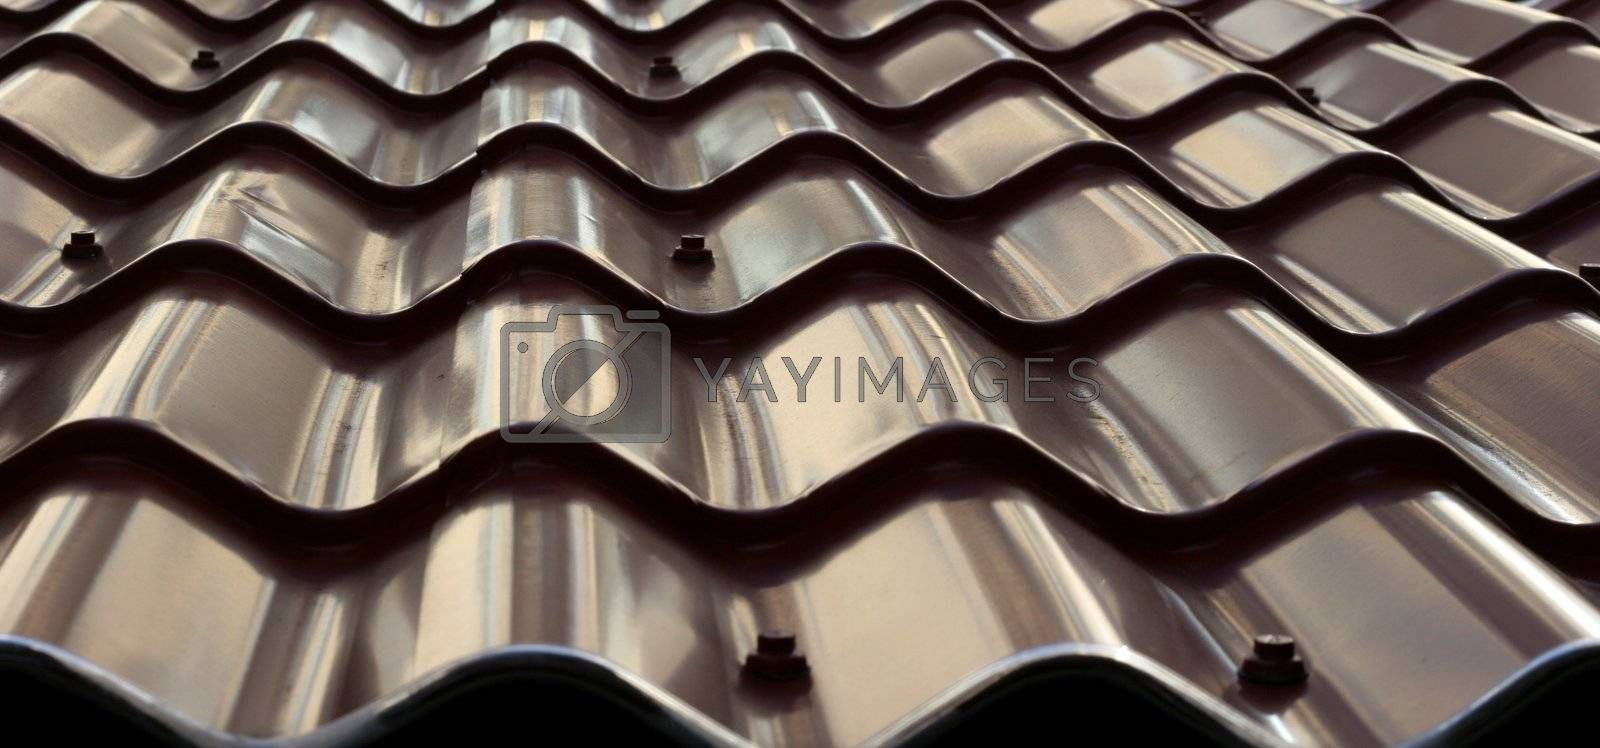 Metal Tiles by dbvirago